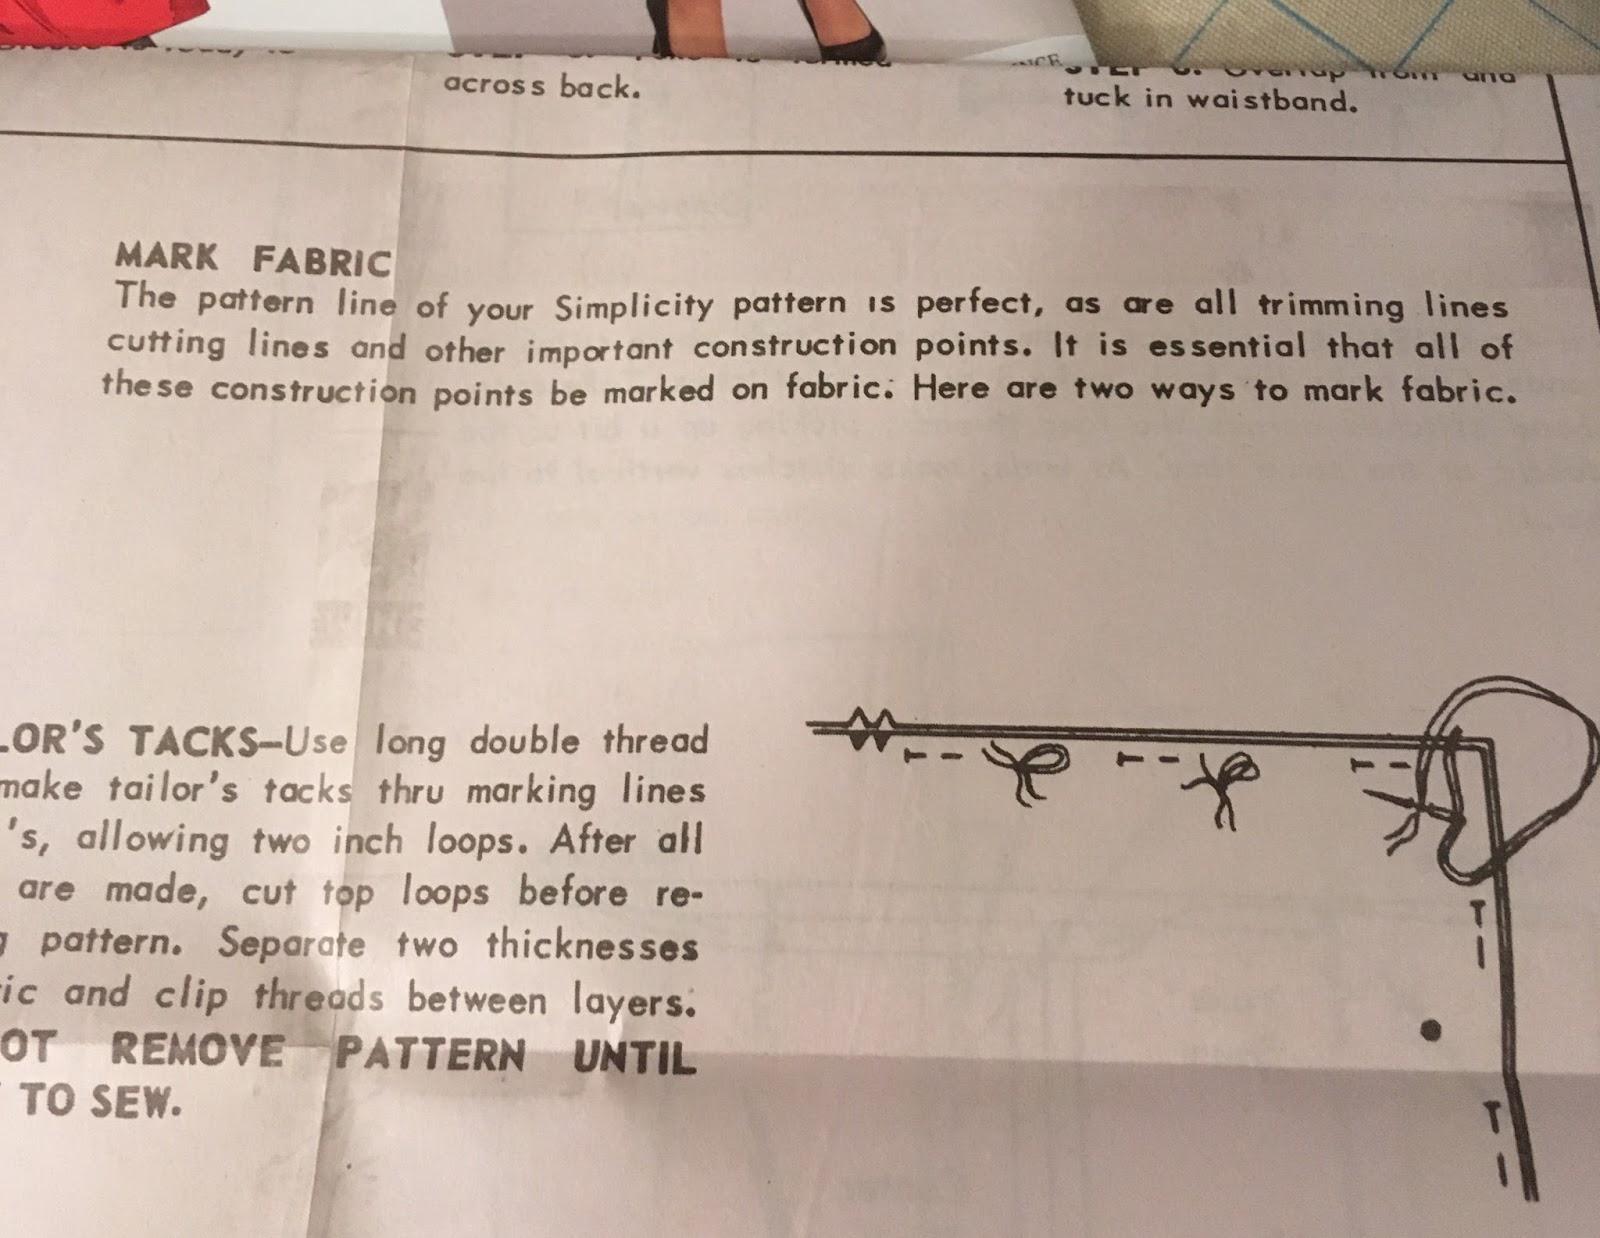 ernie k designs: Instructions are the hardest part